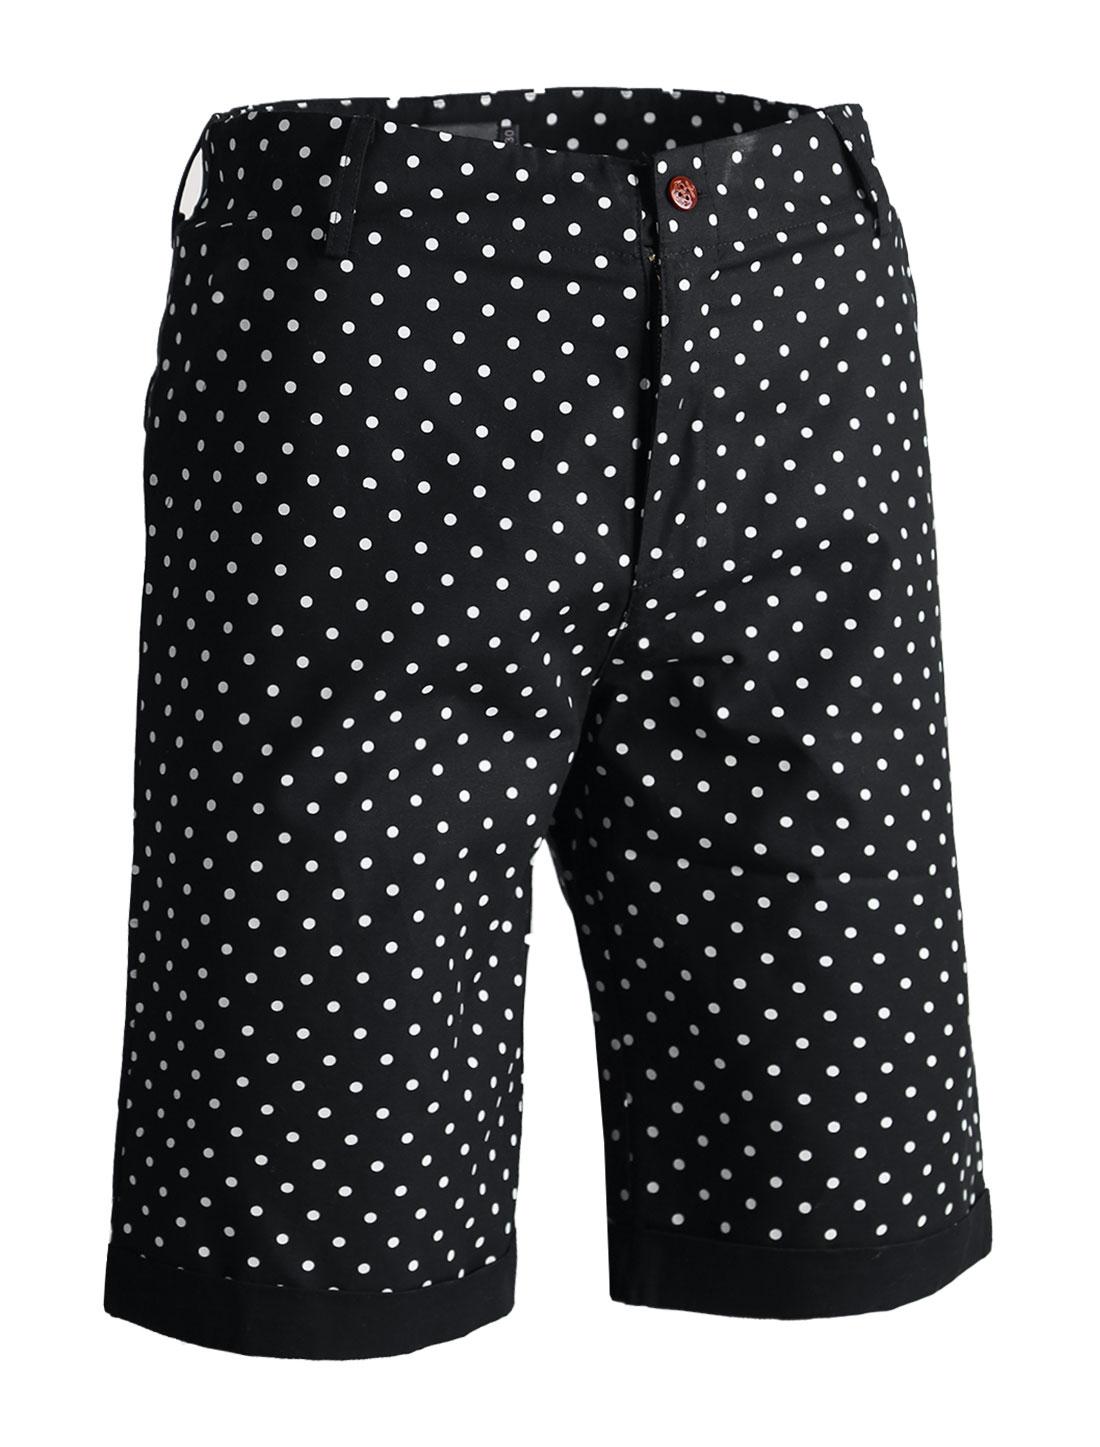 Men Polka Dot Print Cuffed Slim Chino Shorts Black W30